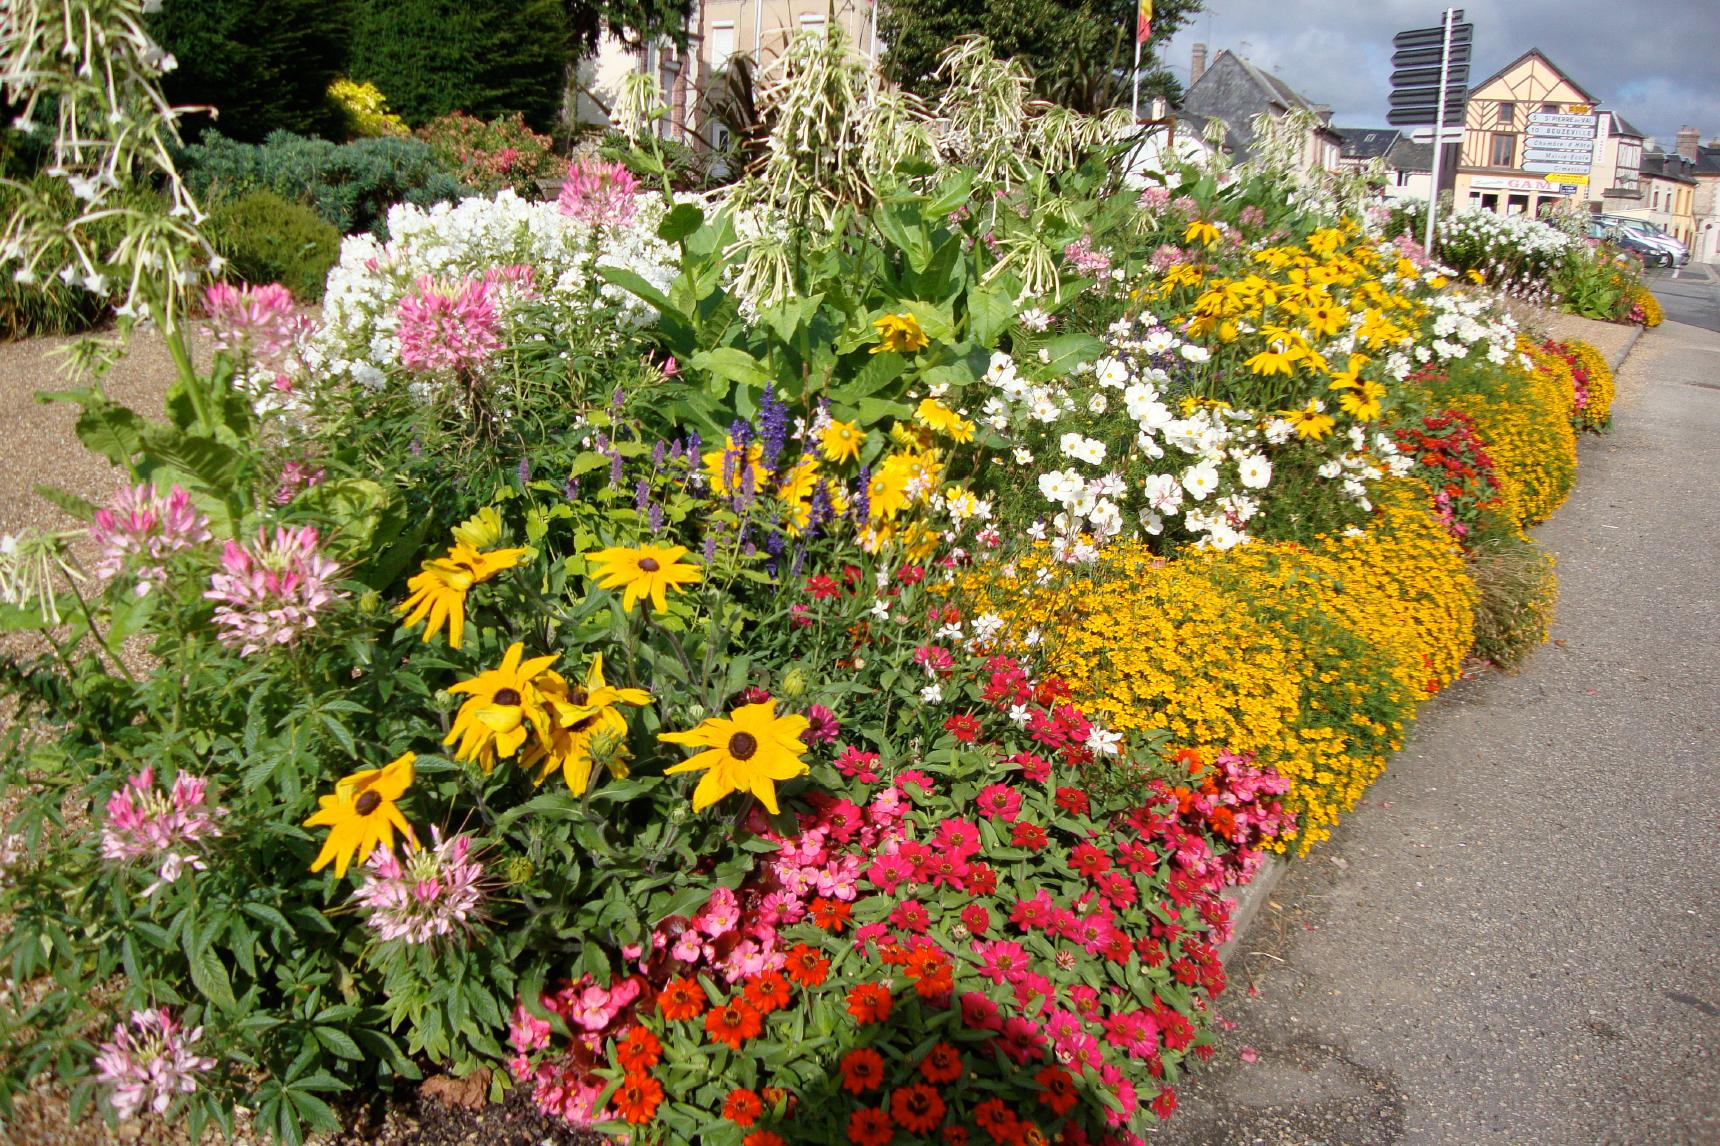 D co petit jardin particulier dijon 21 dijon foot dijon paris blablacar dijon meteoblue - Petit jardin robertson dijon ...